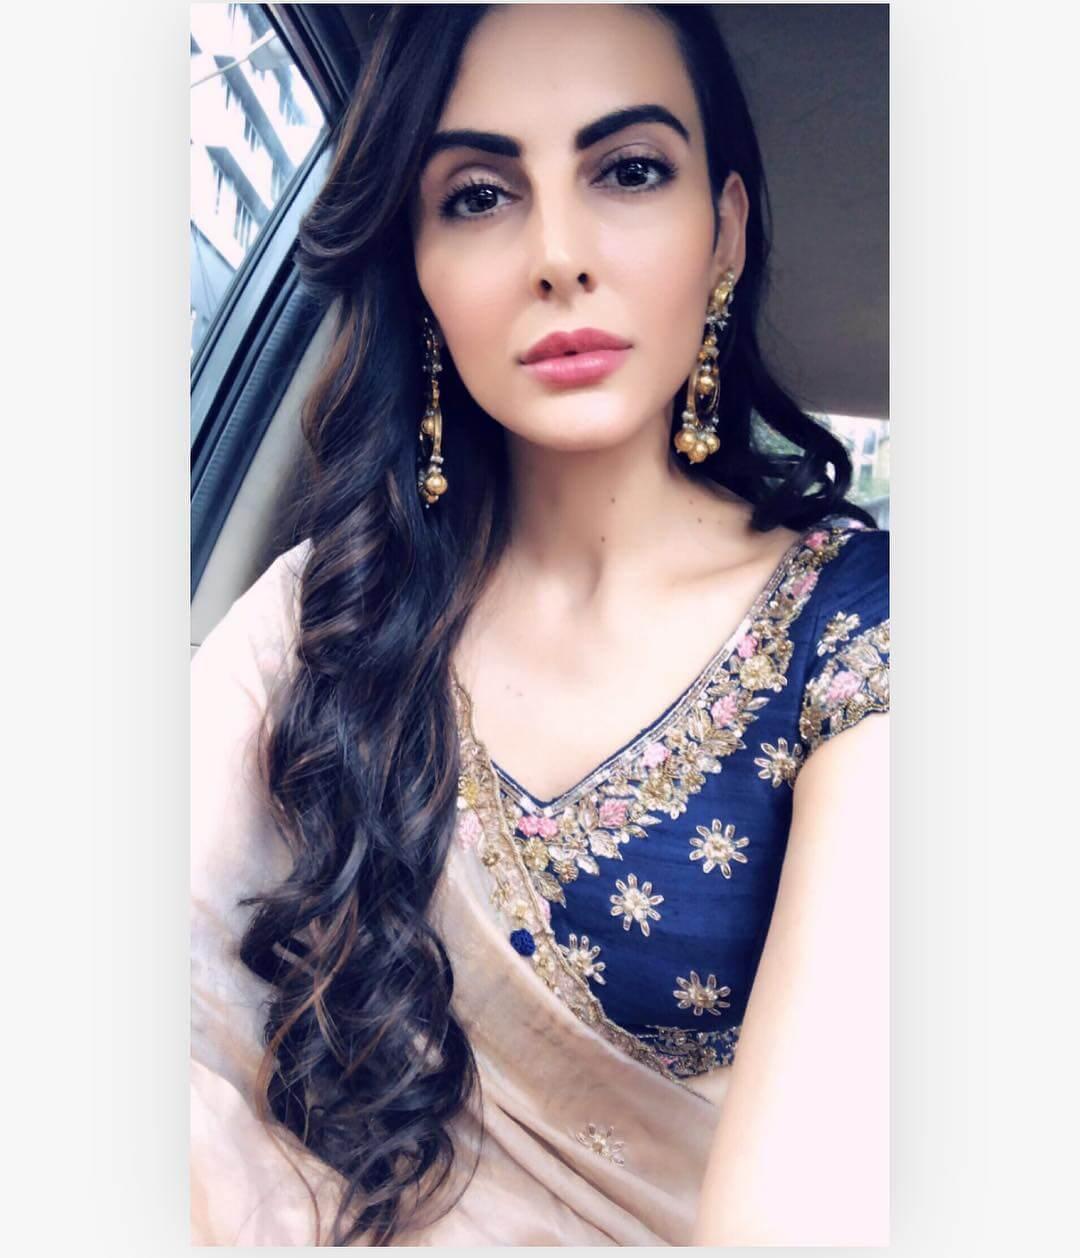 Mandana Karimi Age, Husband, Height, Marriage, Biography, Wedding, Bigg Boss, Wallpaper, Pics, Instagram, Facebook, Twitter (14)